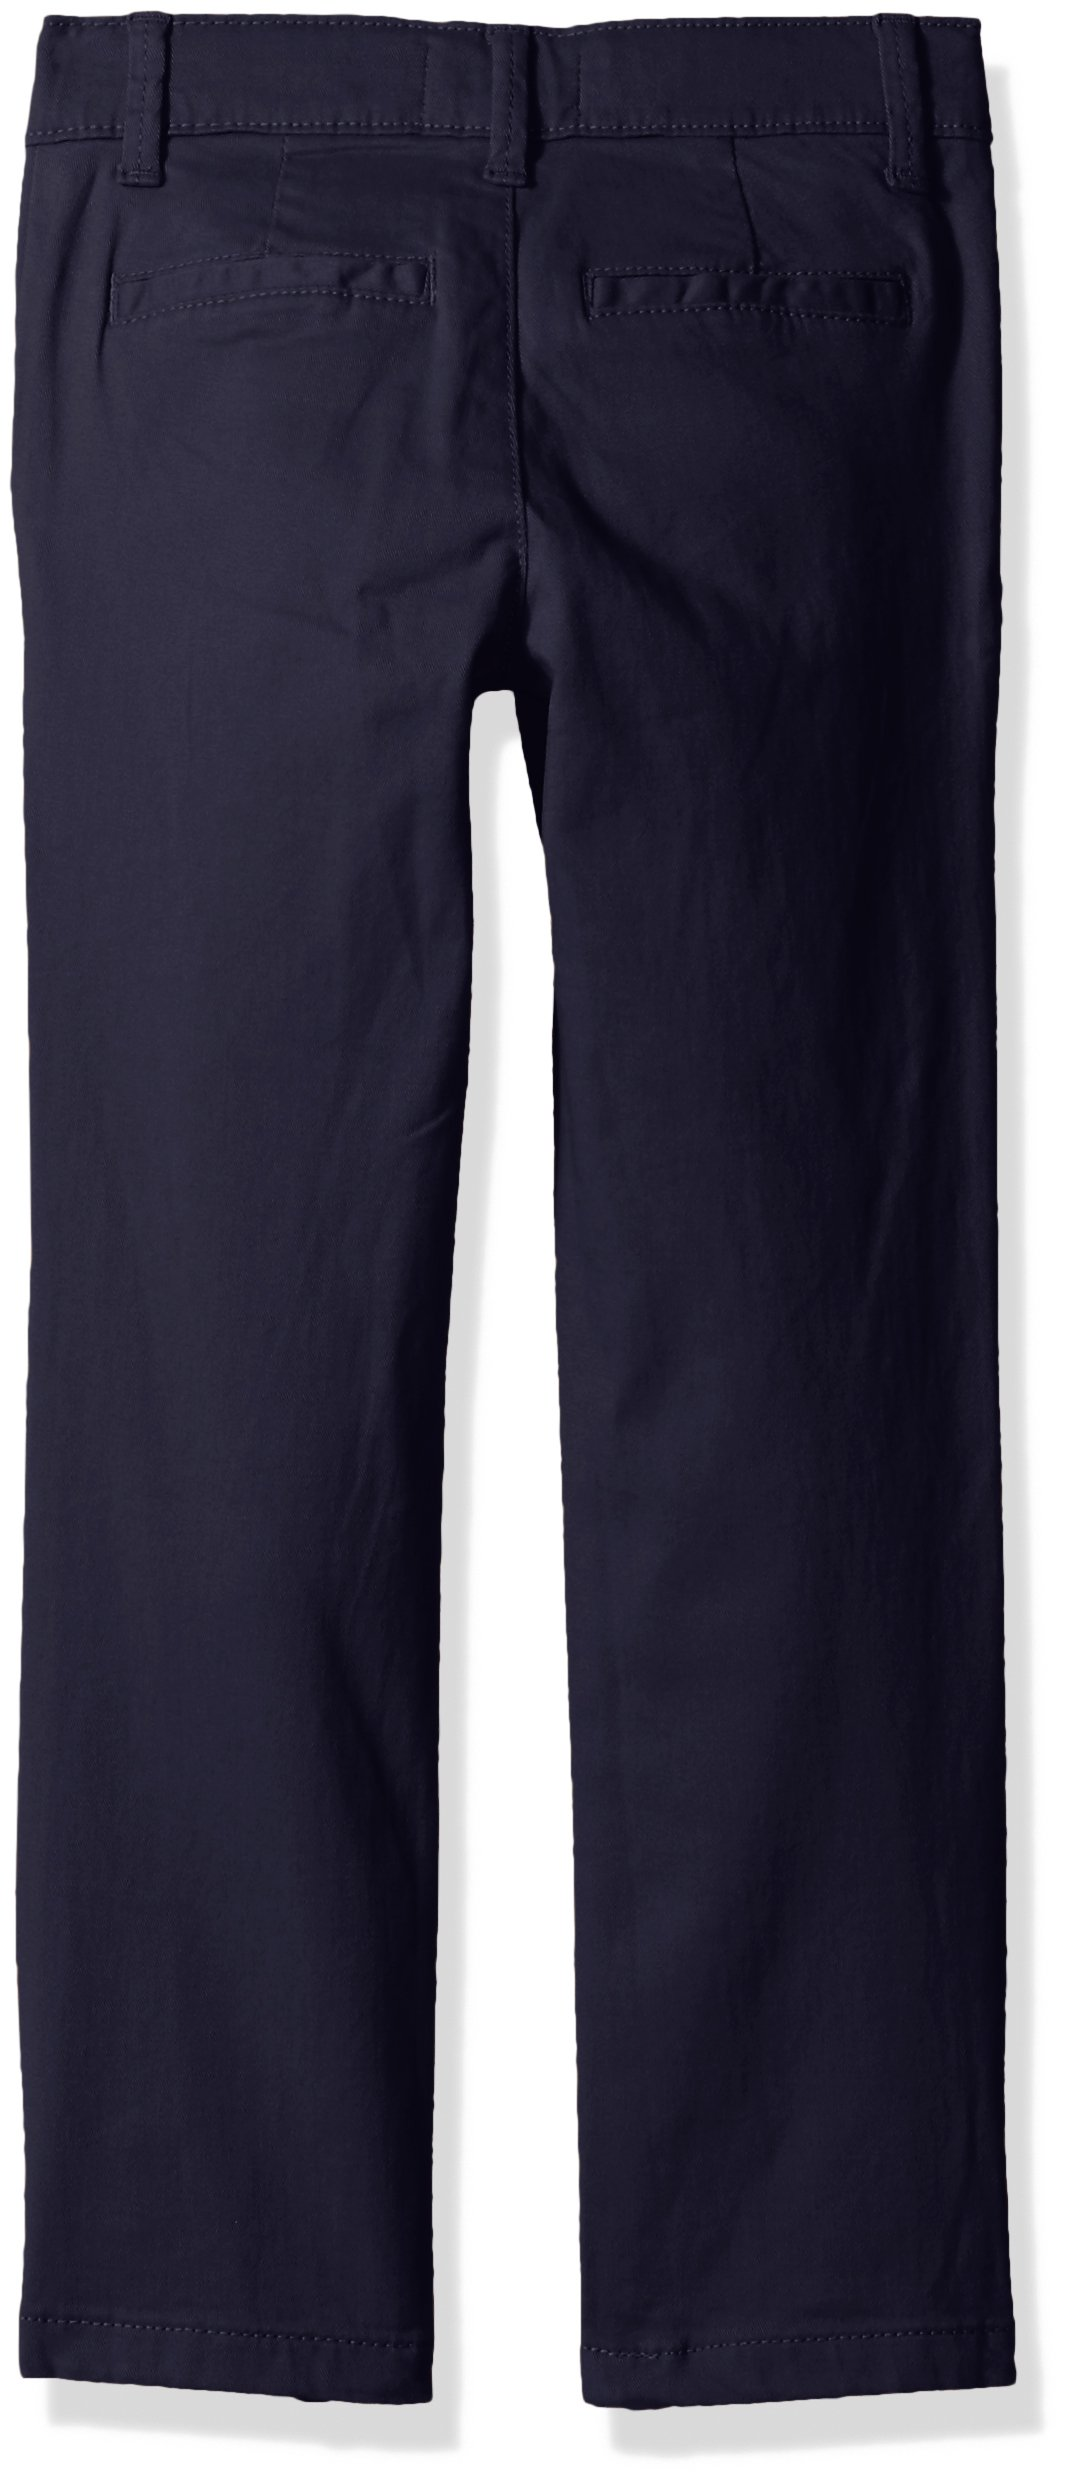 The Children's Place Girls Size Skinny Uniform Pants, Tidal 4405, 12 Slim by The Children's Place (Image #2)